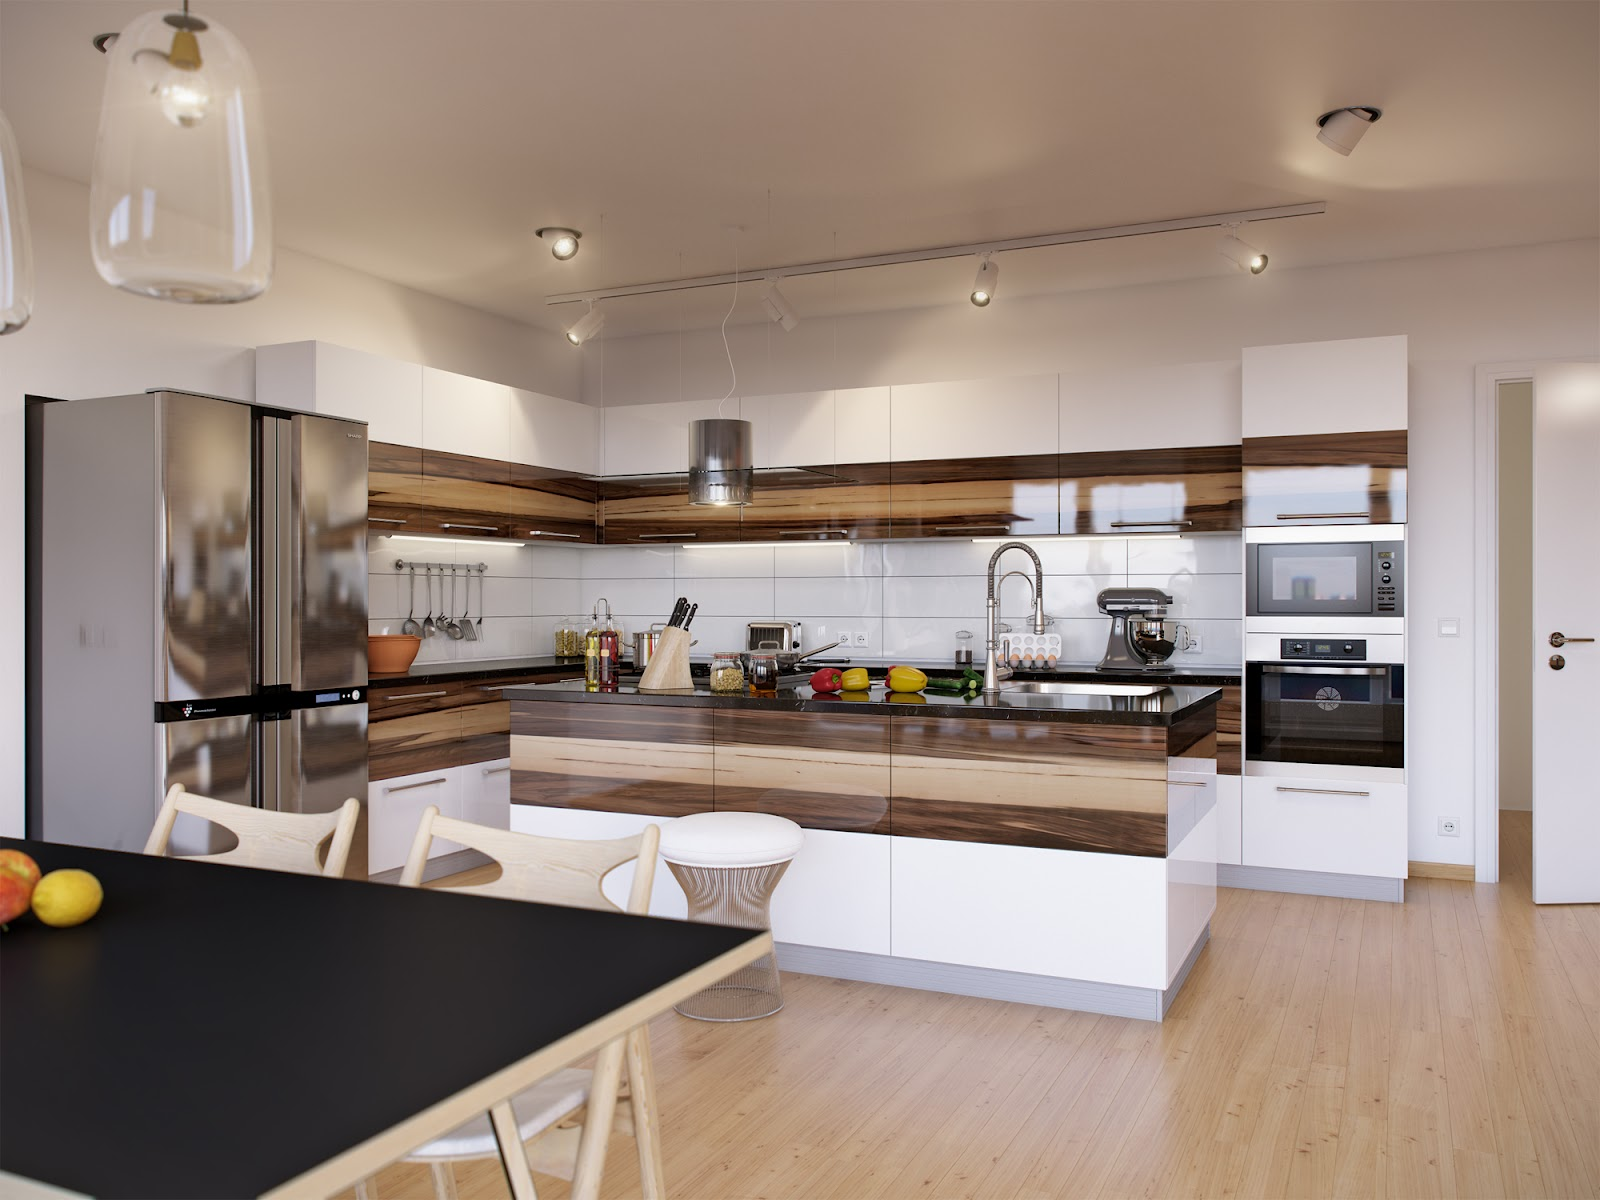 kitchen interior design ideas wood tones and white